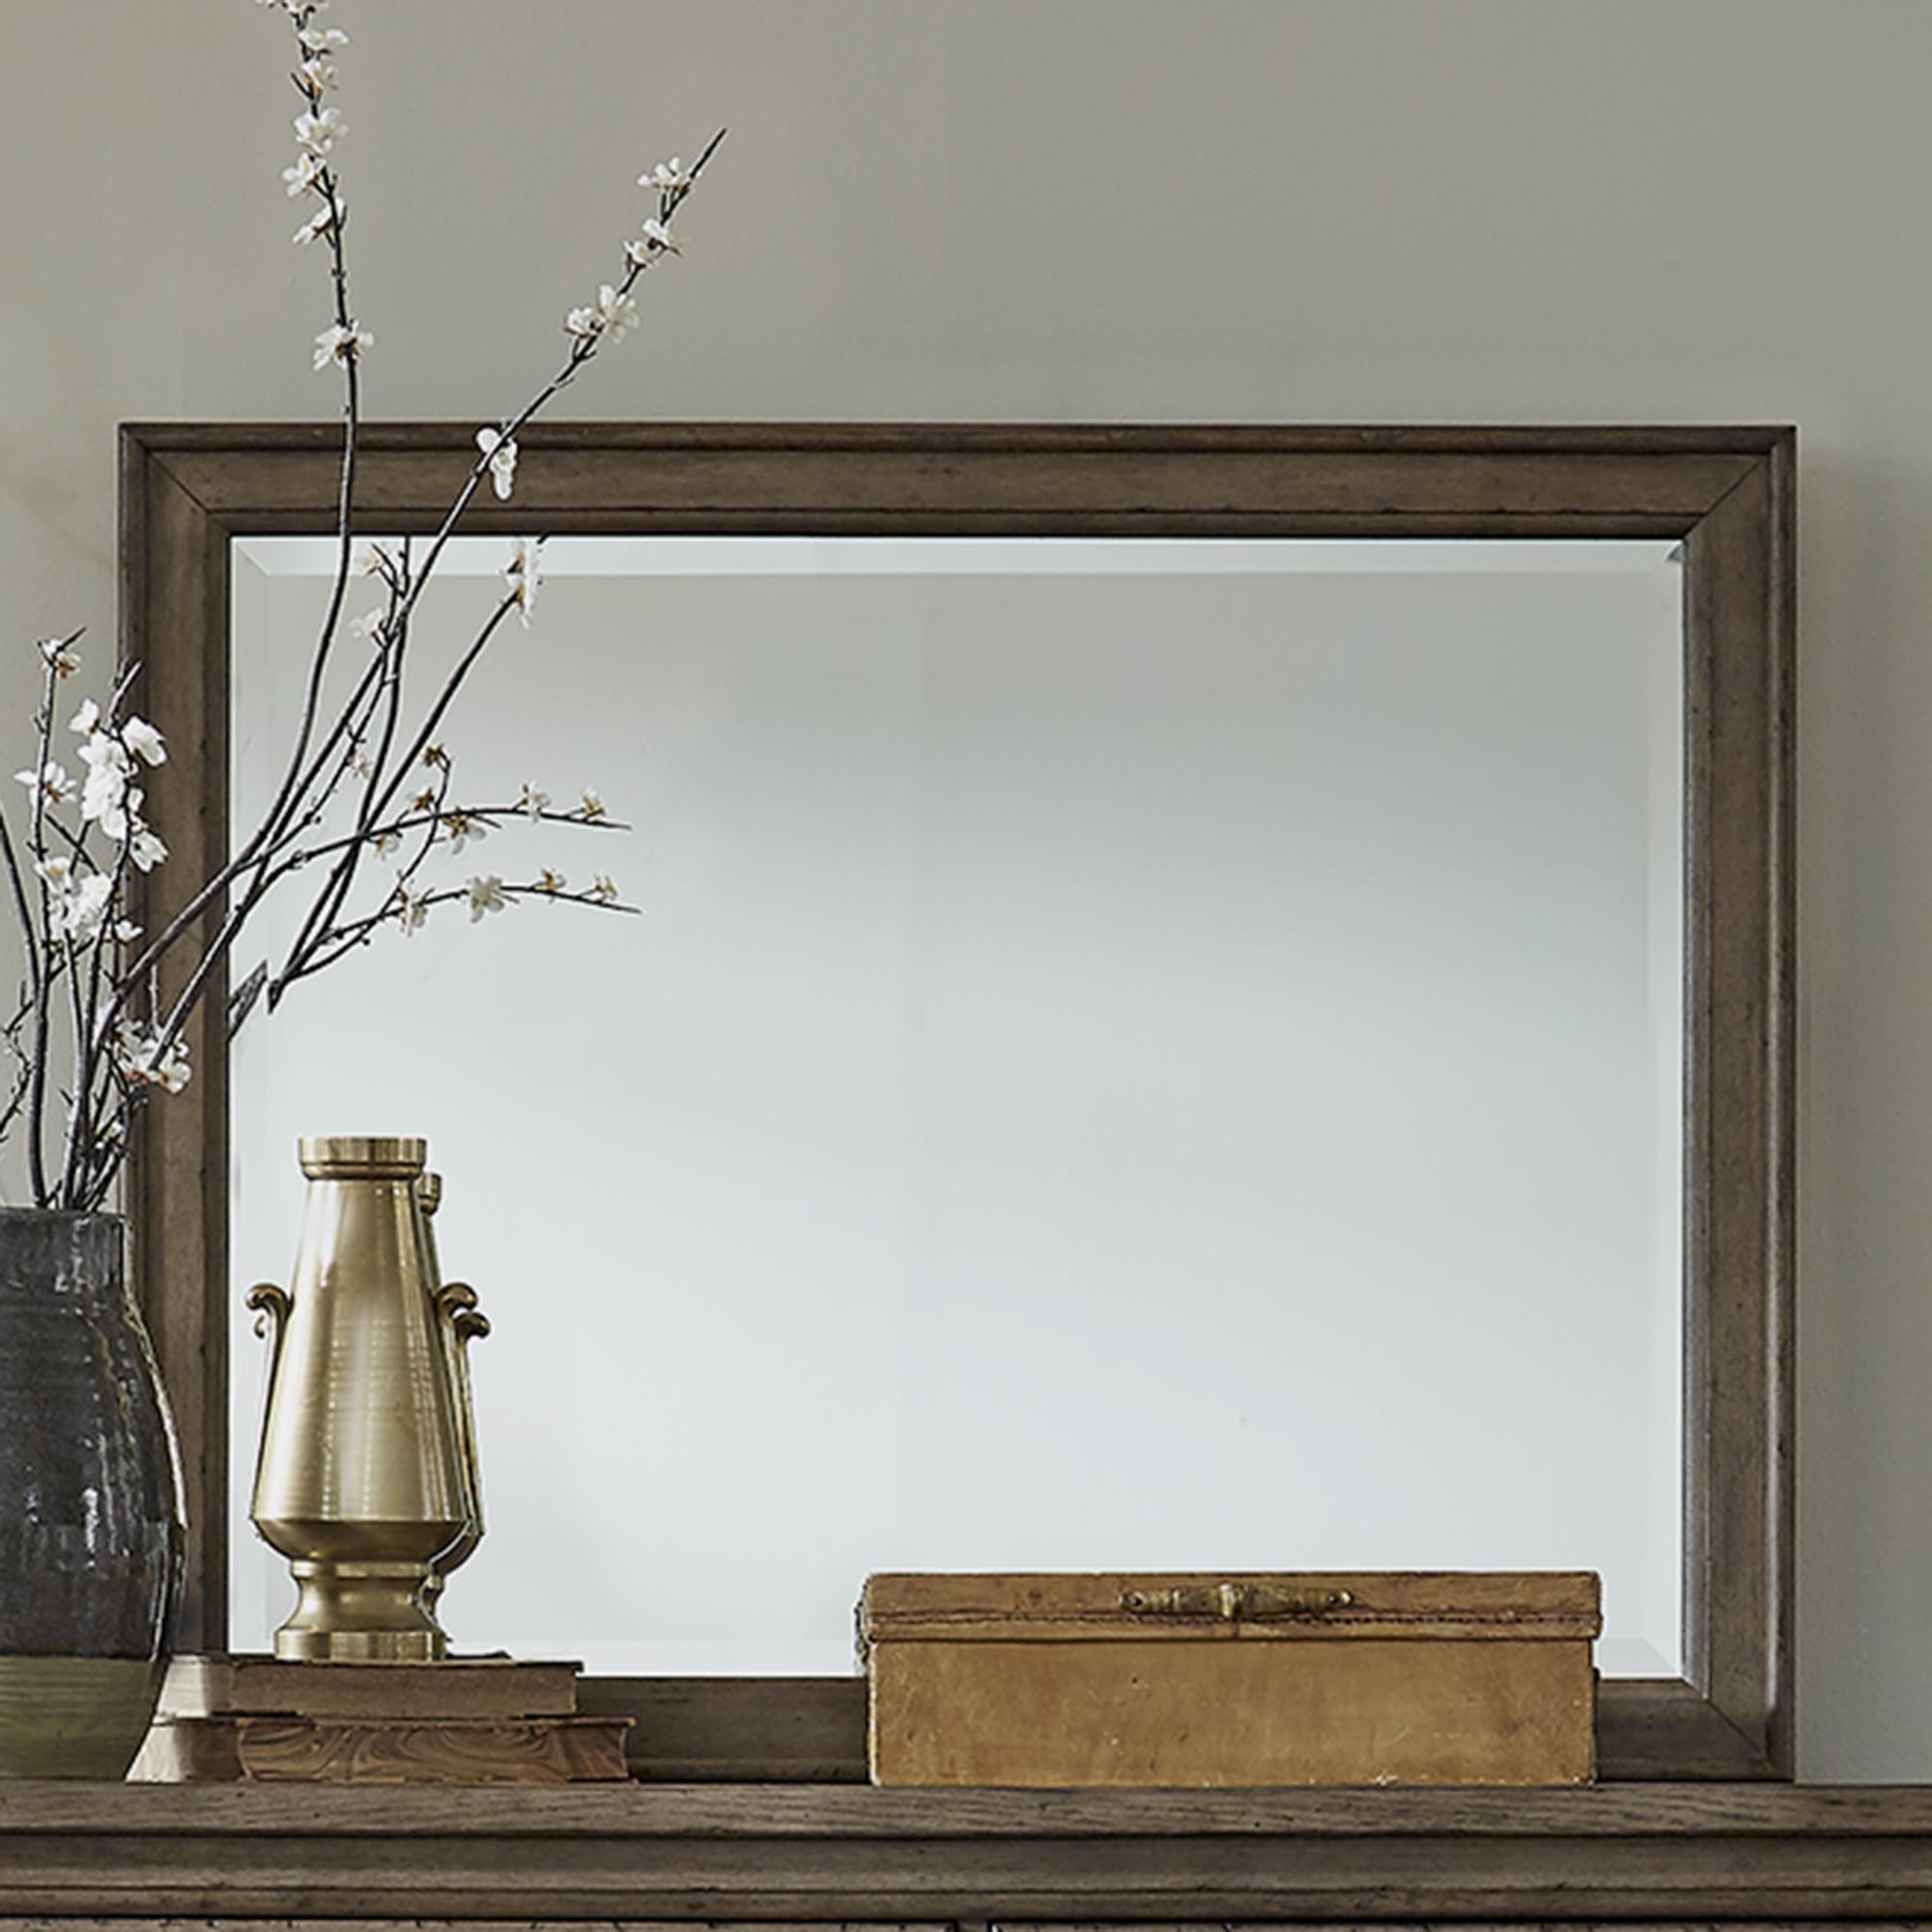 Americana Farmhouse Landscape Dresser Mirror by Liberty Furniture at Lynn's Furniture & Mattress